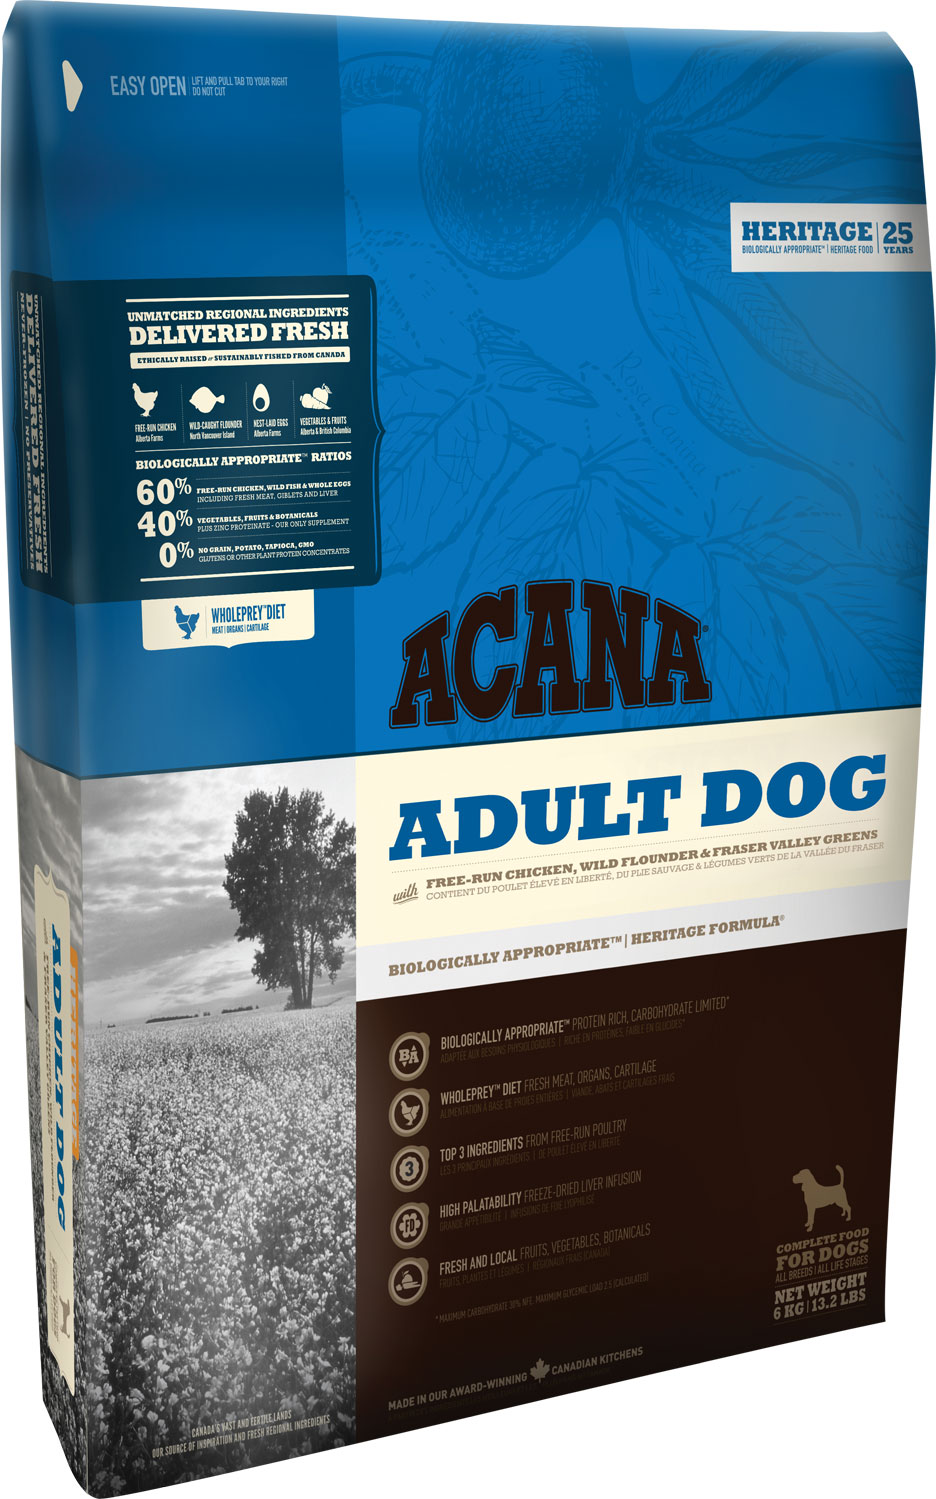 ACANA Adult Dog 2 kg.